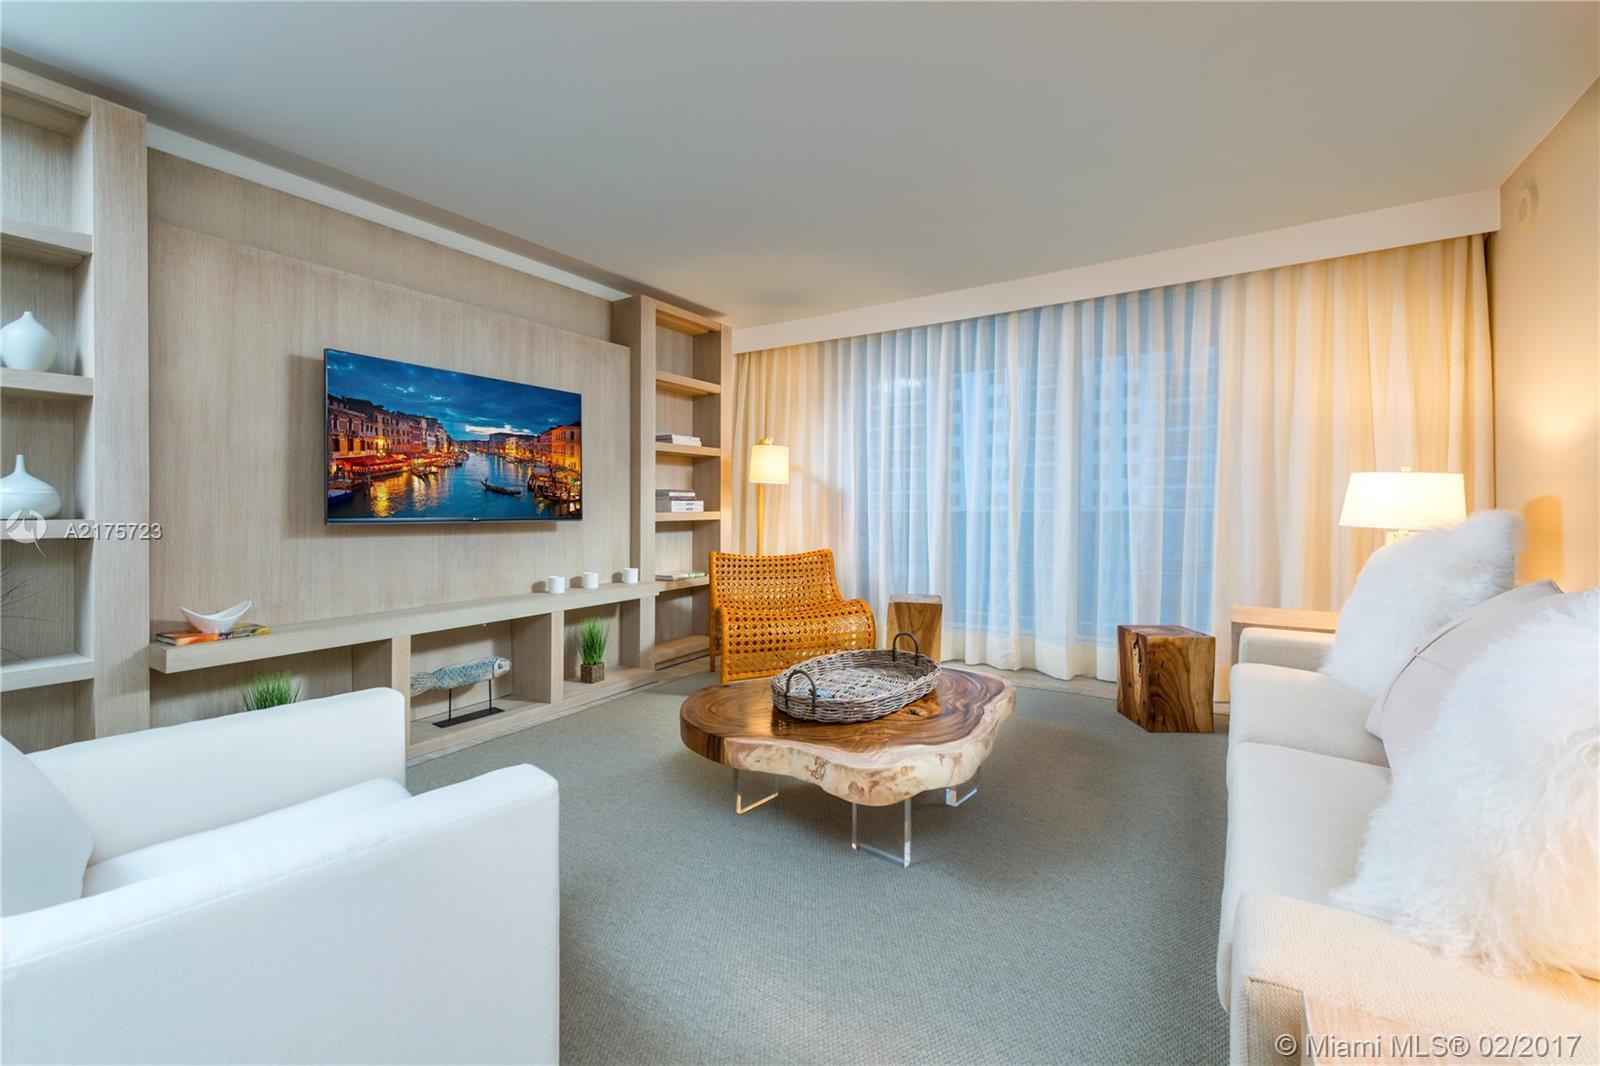 102 24 ST #1010, Miami Beach, FL 33139 - Miami Beach, FL real estate listing